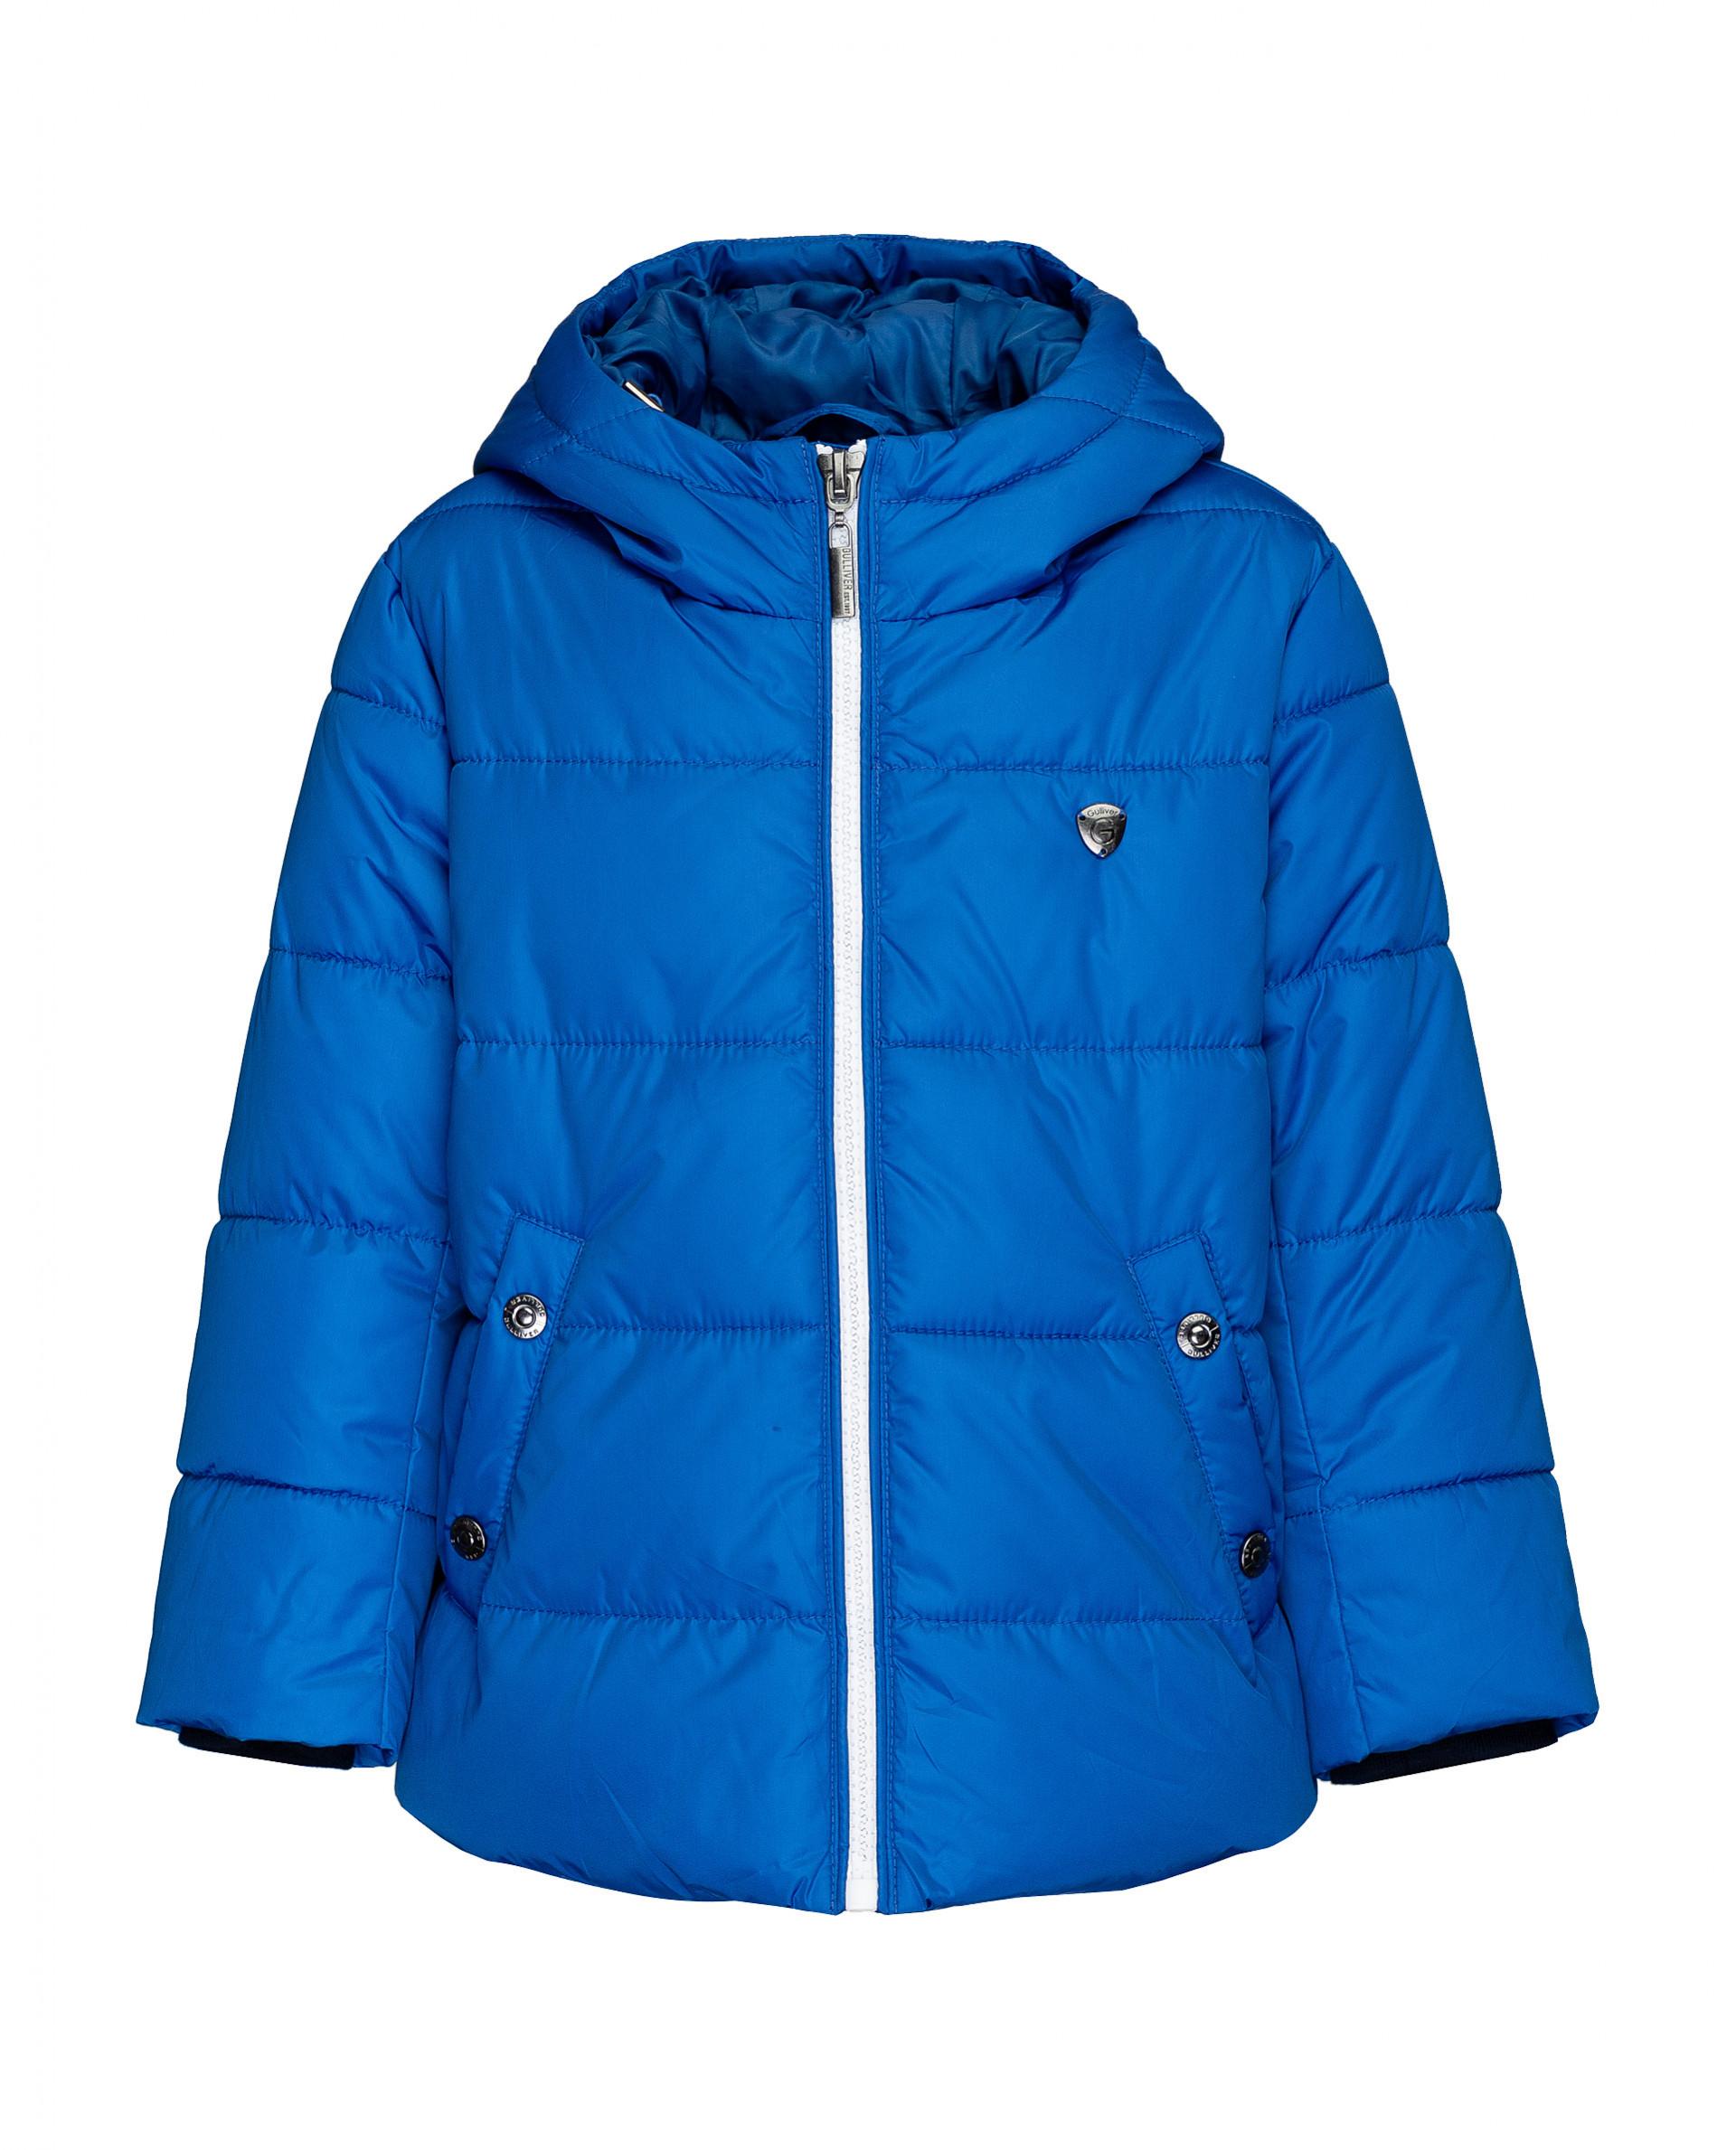 Картинки синяя куртка